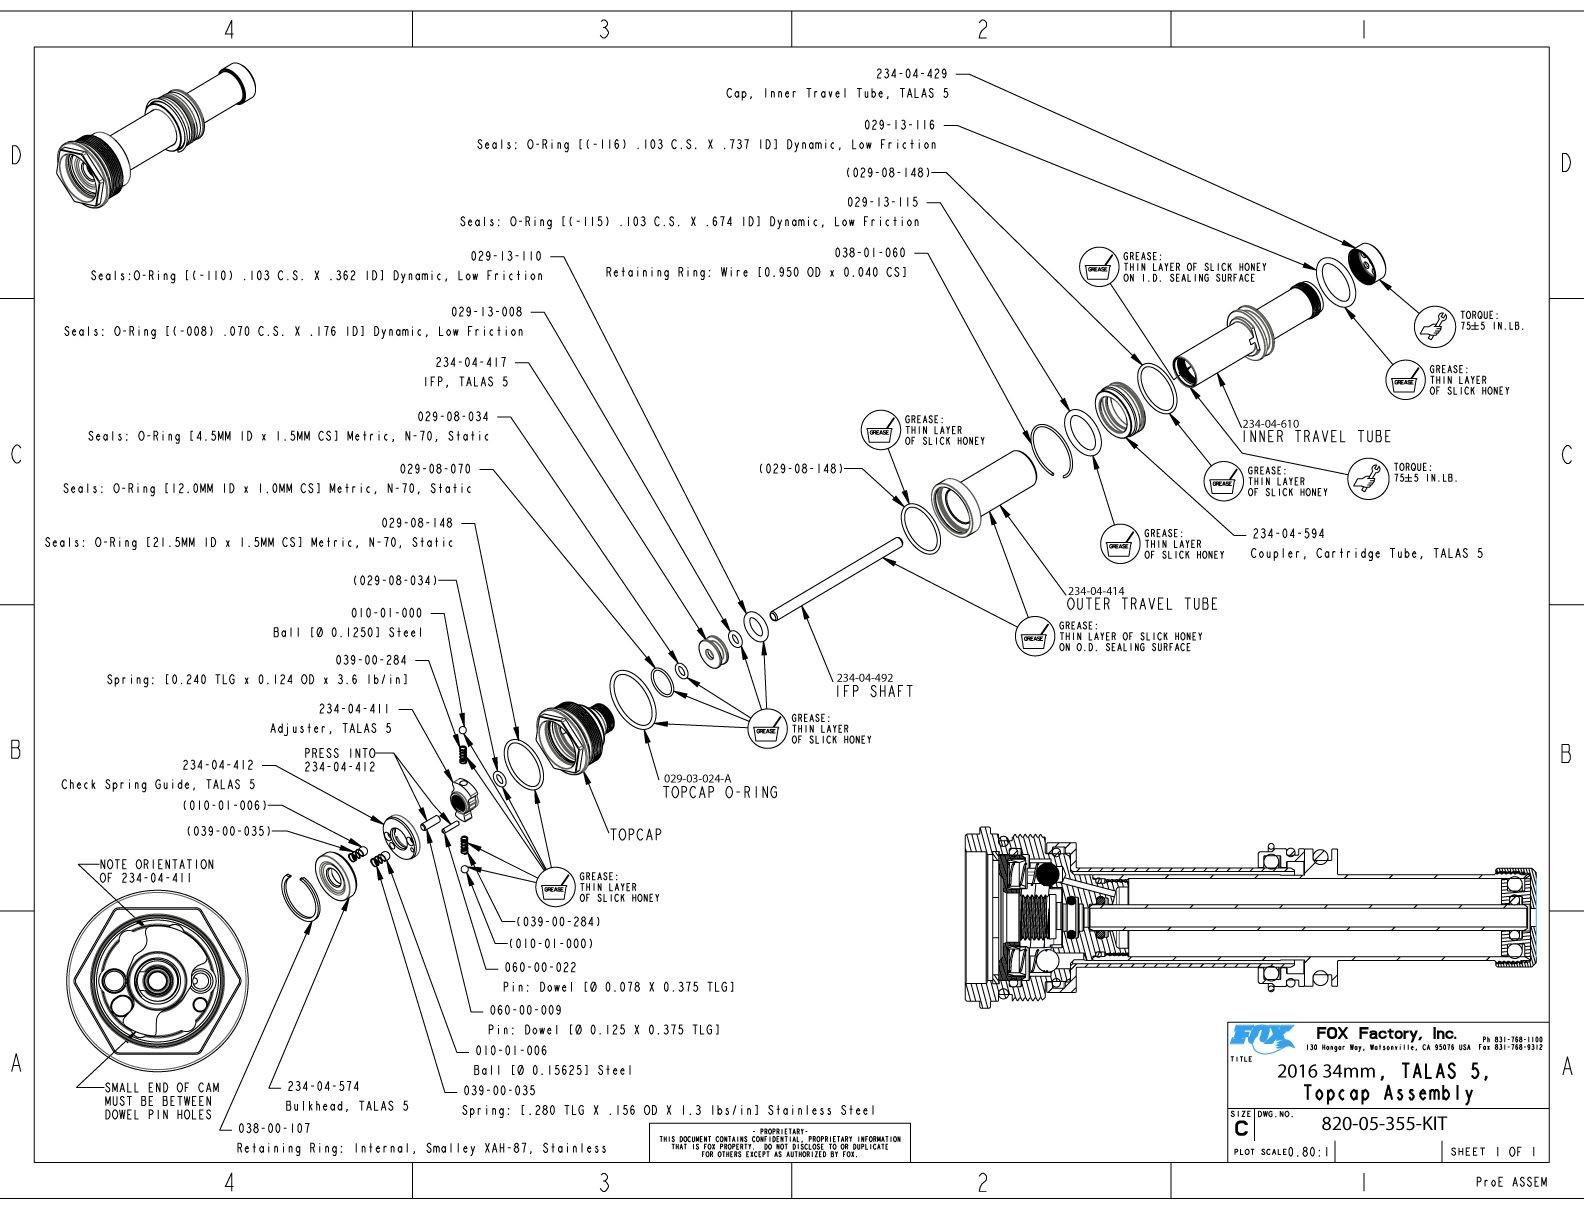 Car Assembly Line Diagram